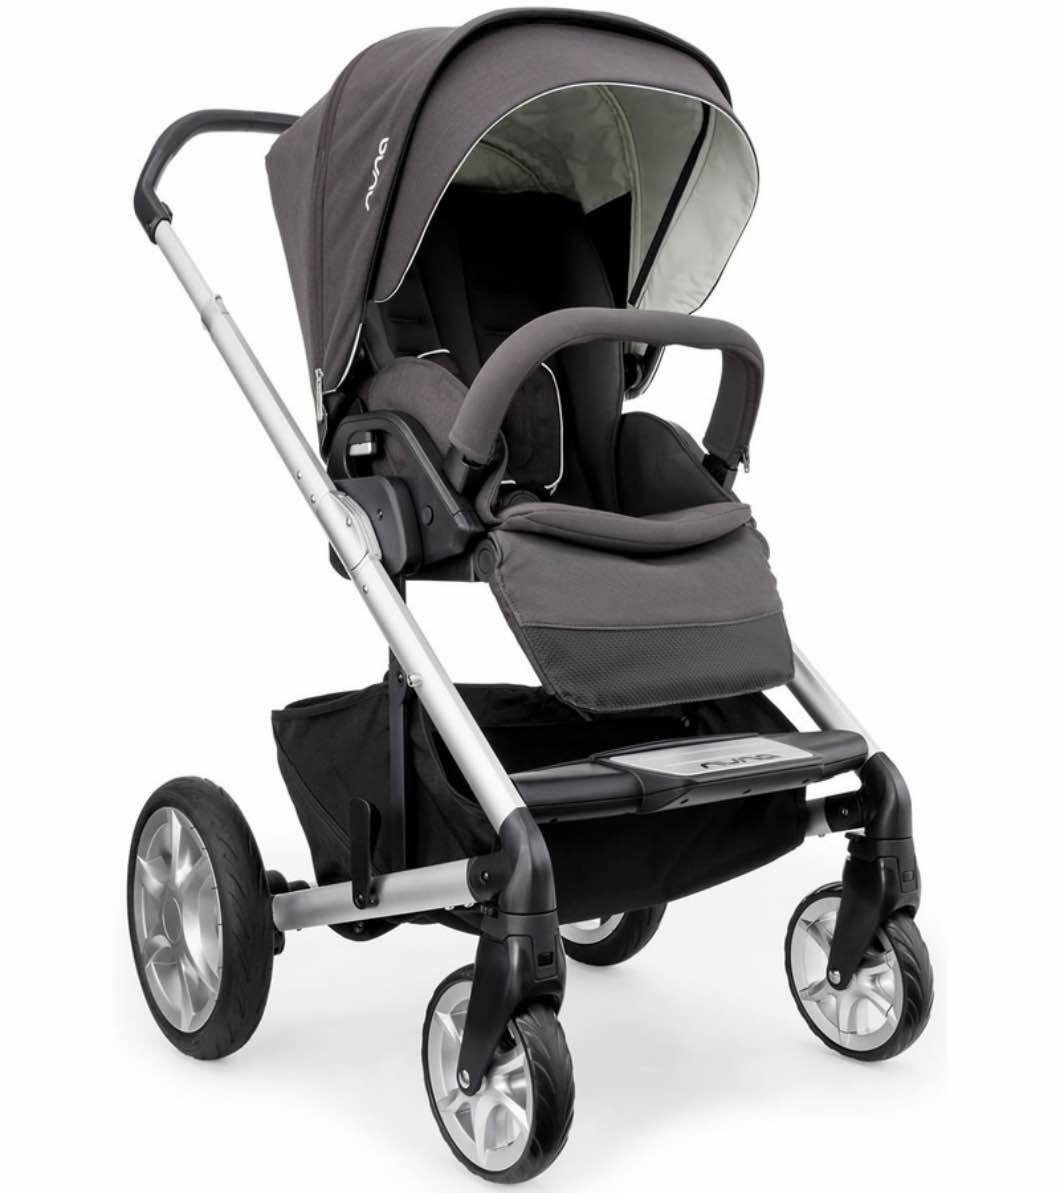 40+ Nuna mixx stroller review information